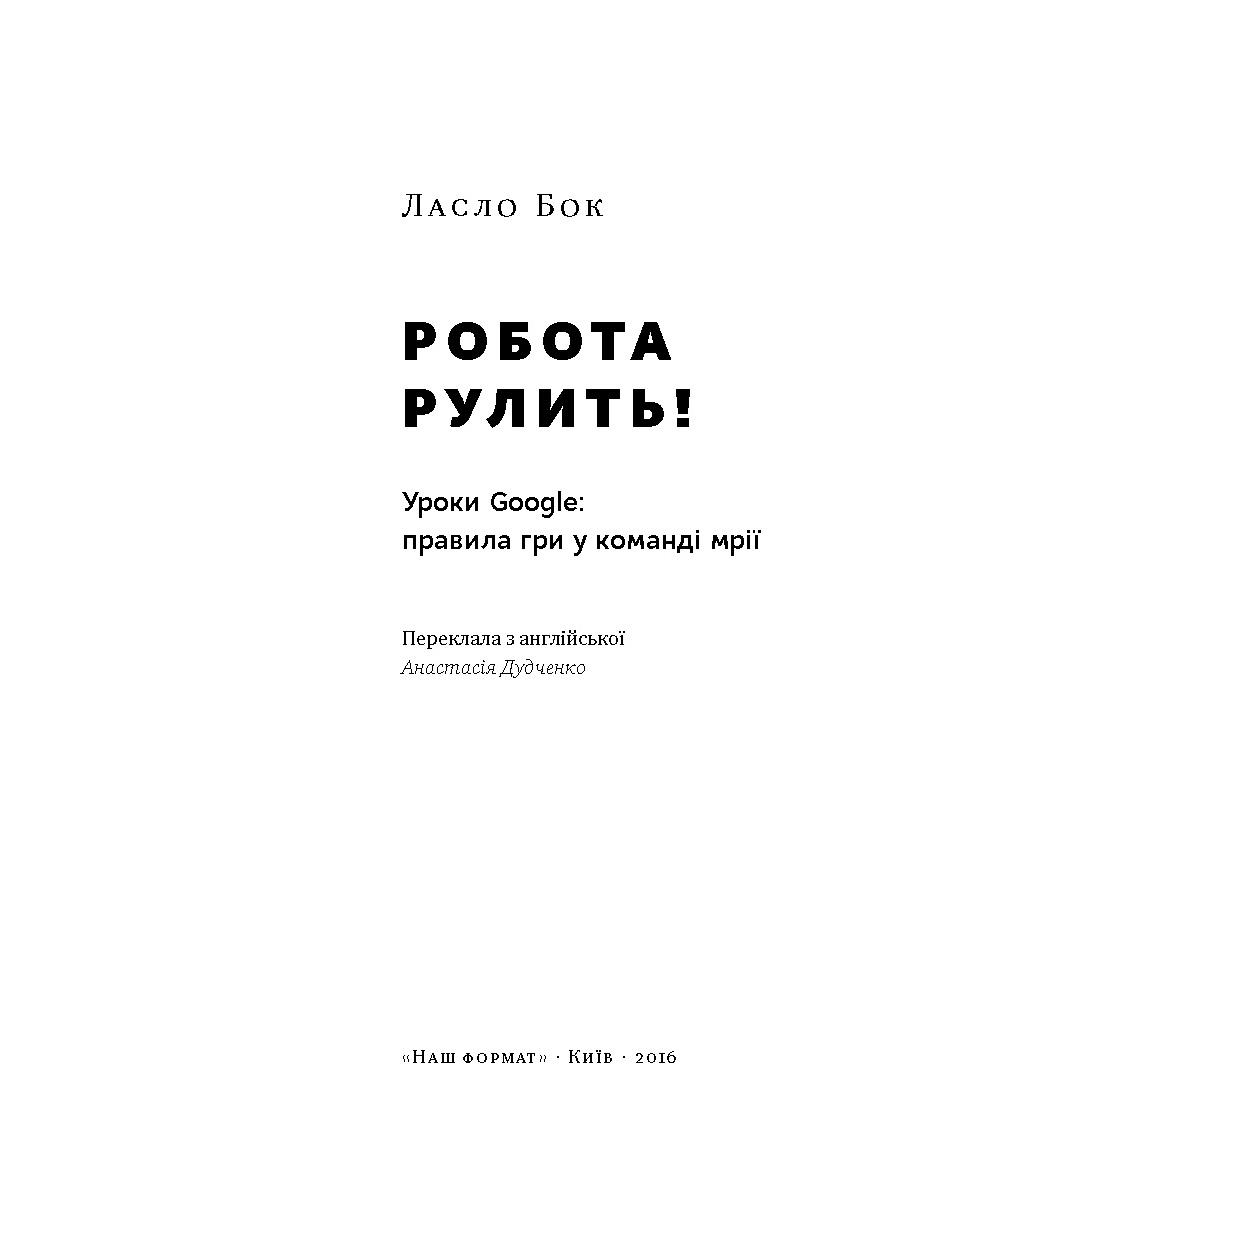 063_bock-laszlo_robota-rulyt_